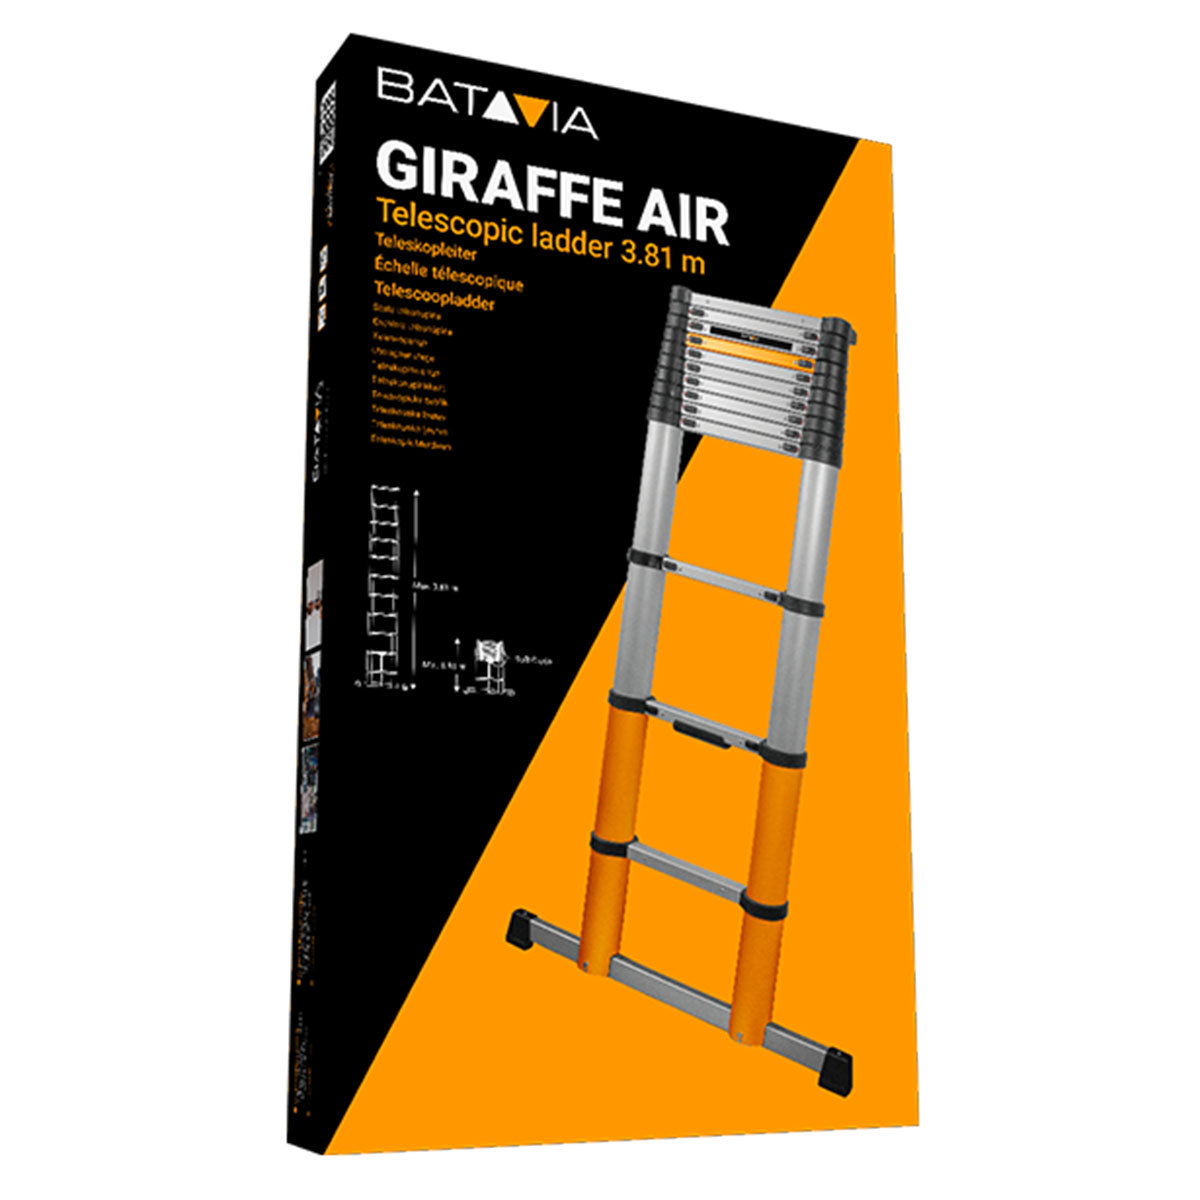 Teleskopleiter Giraffe Air 3,81 m mit Stand- & Quertraverse | #3